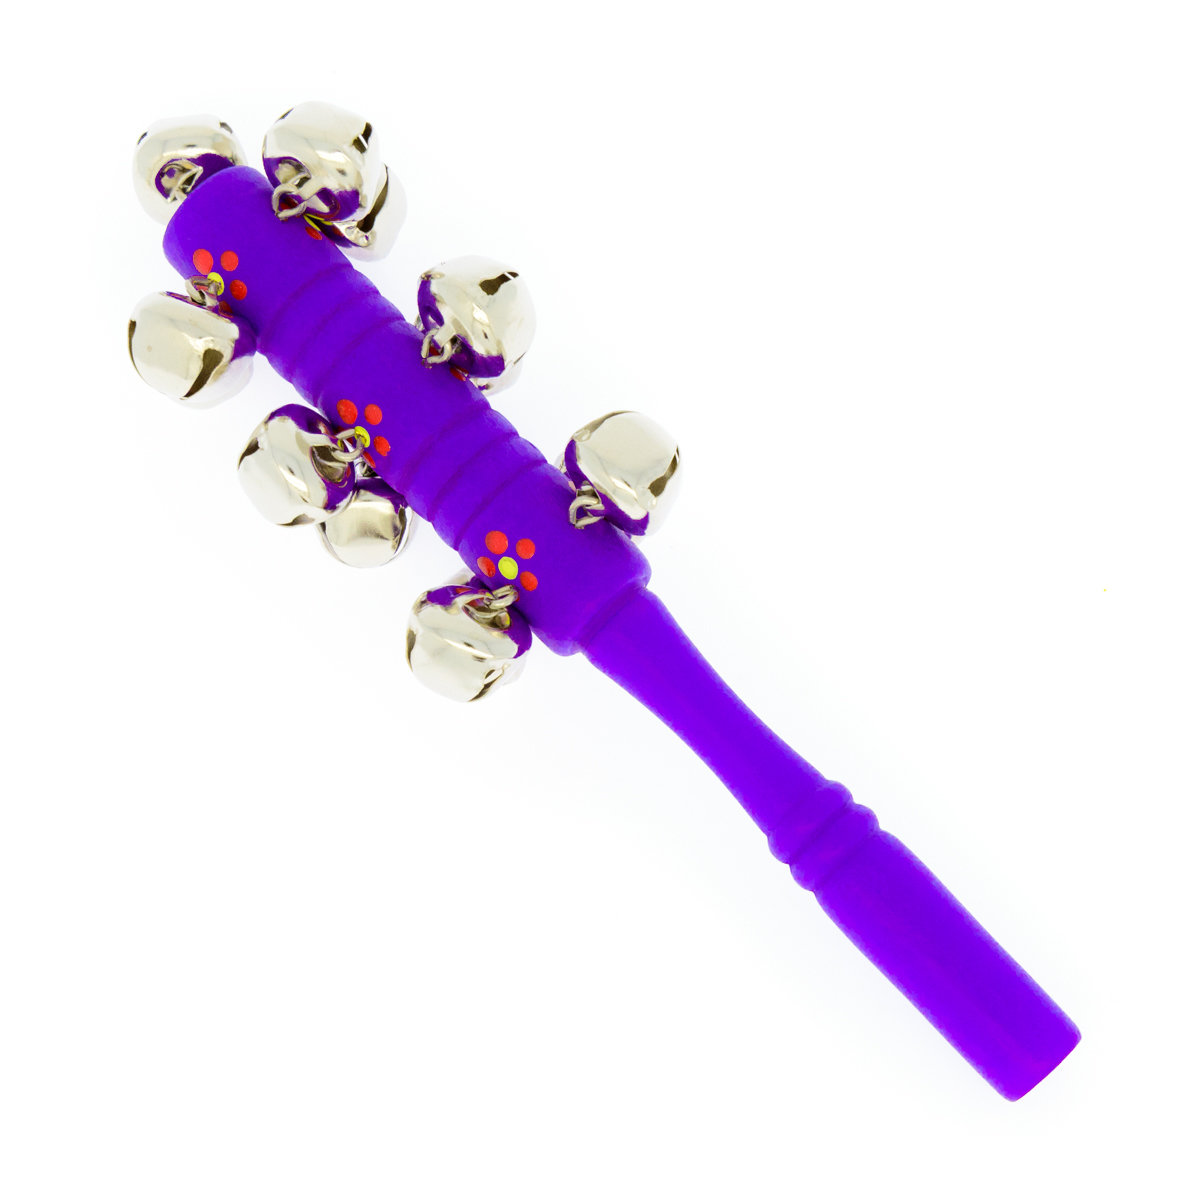 Стучалка большая (бубенцы, фиолетовая)